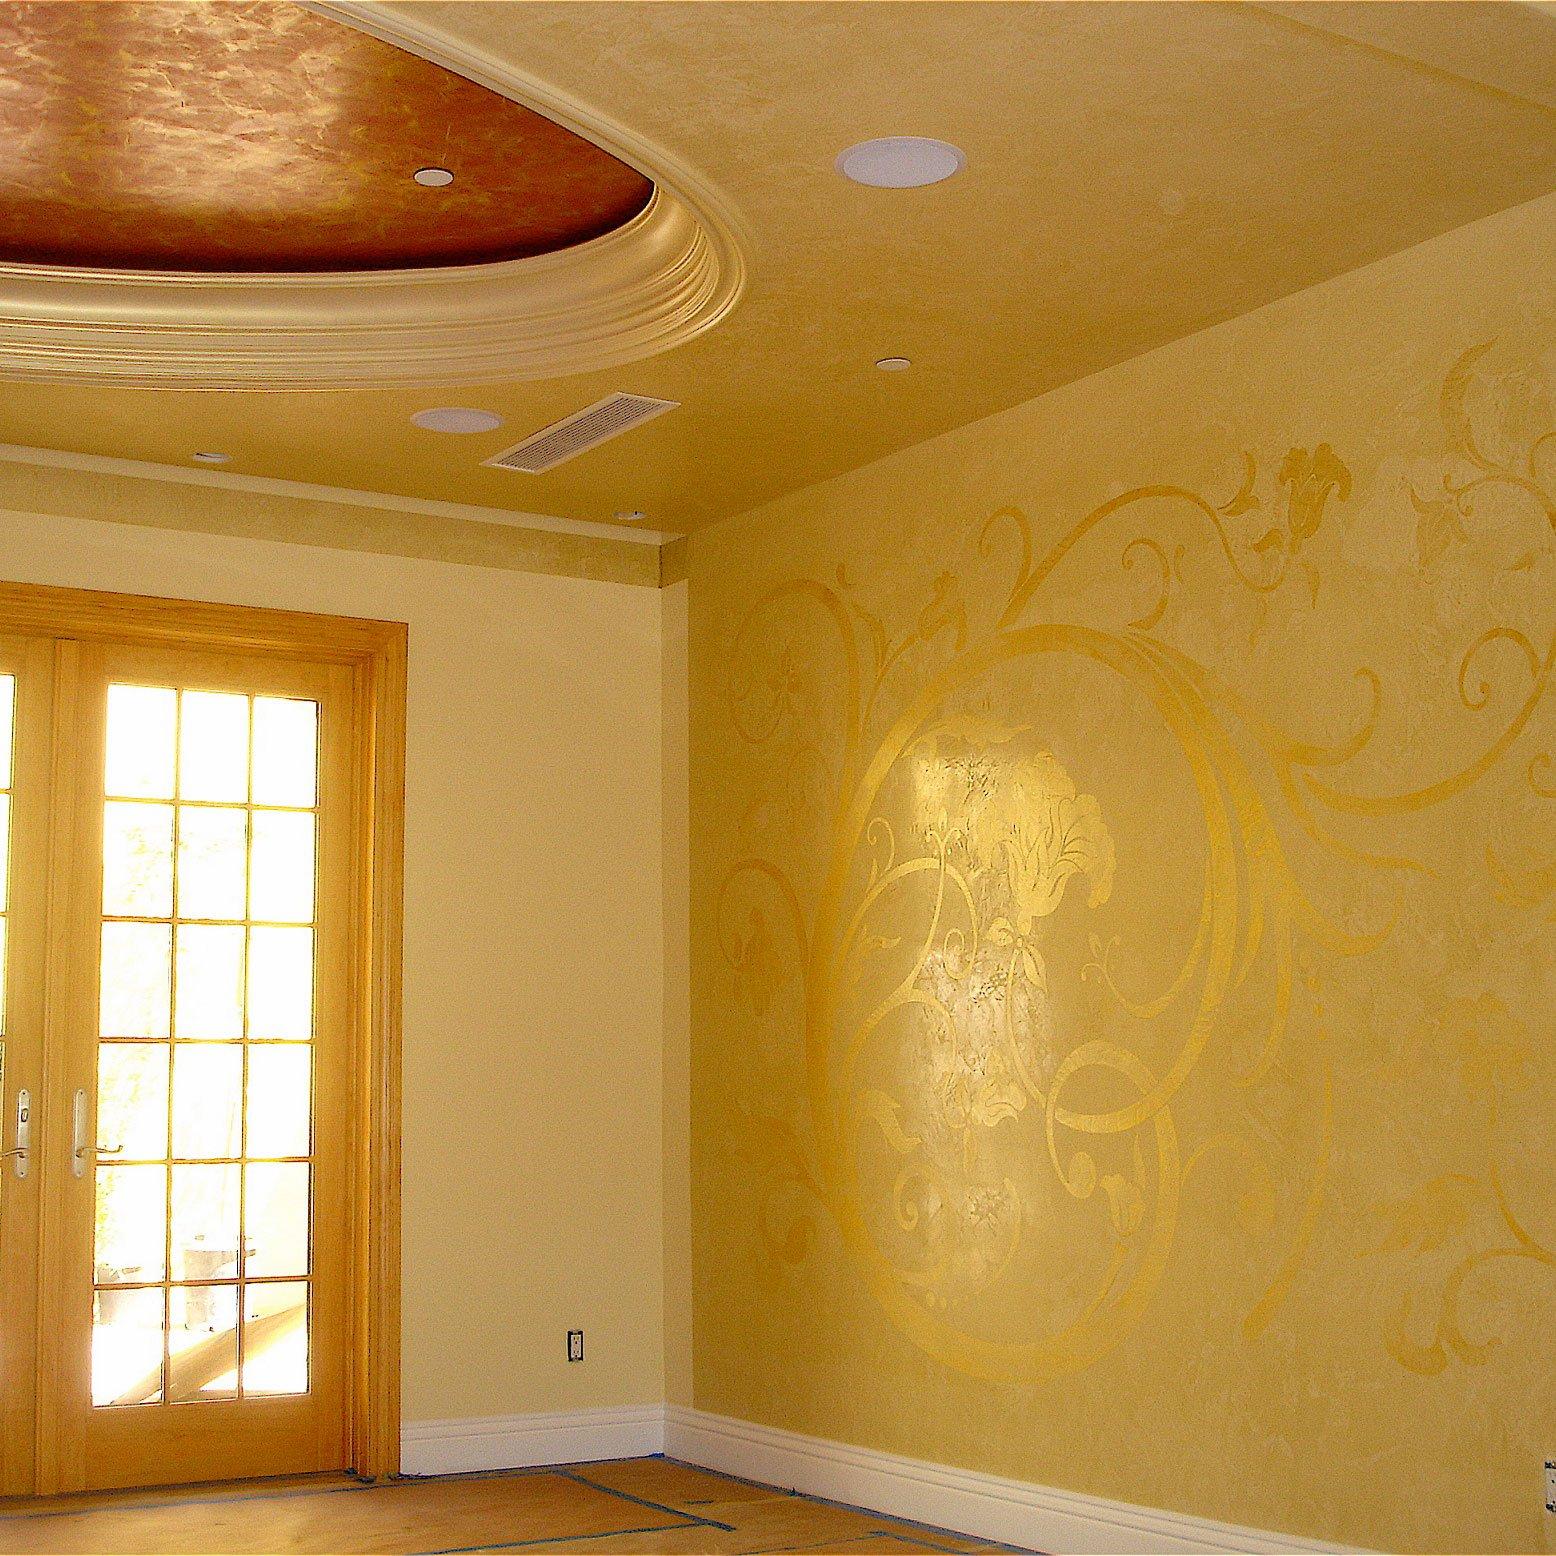 Stucco Lamundo Venetian Plaster with Metallic Wax | Meoded Paint ...